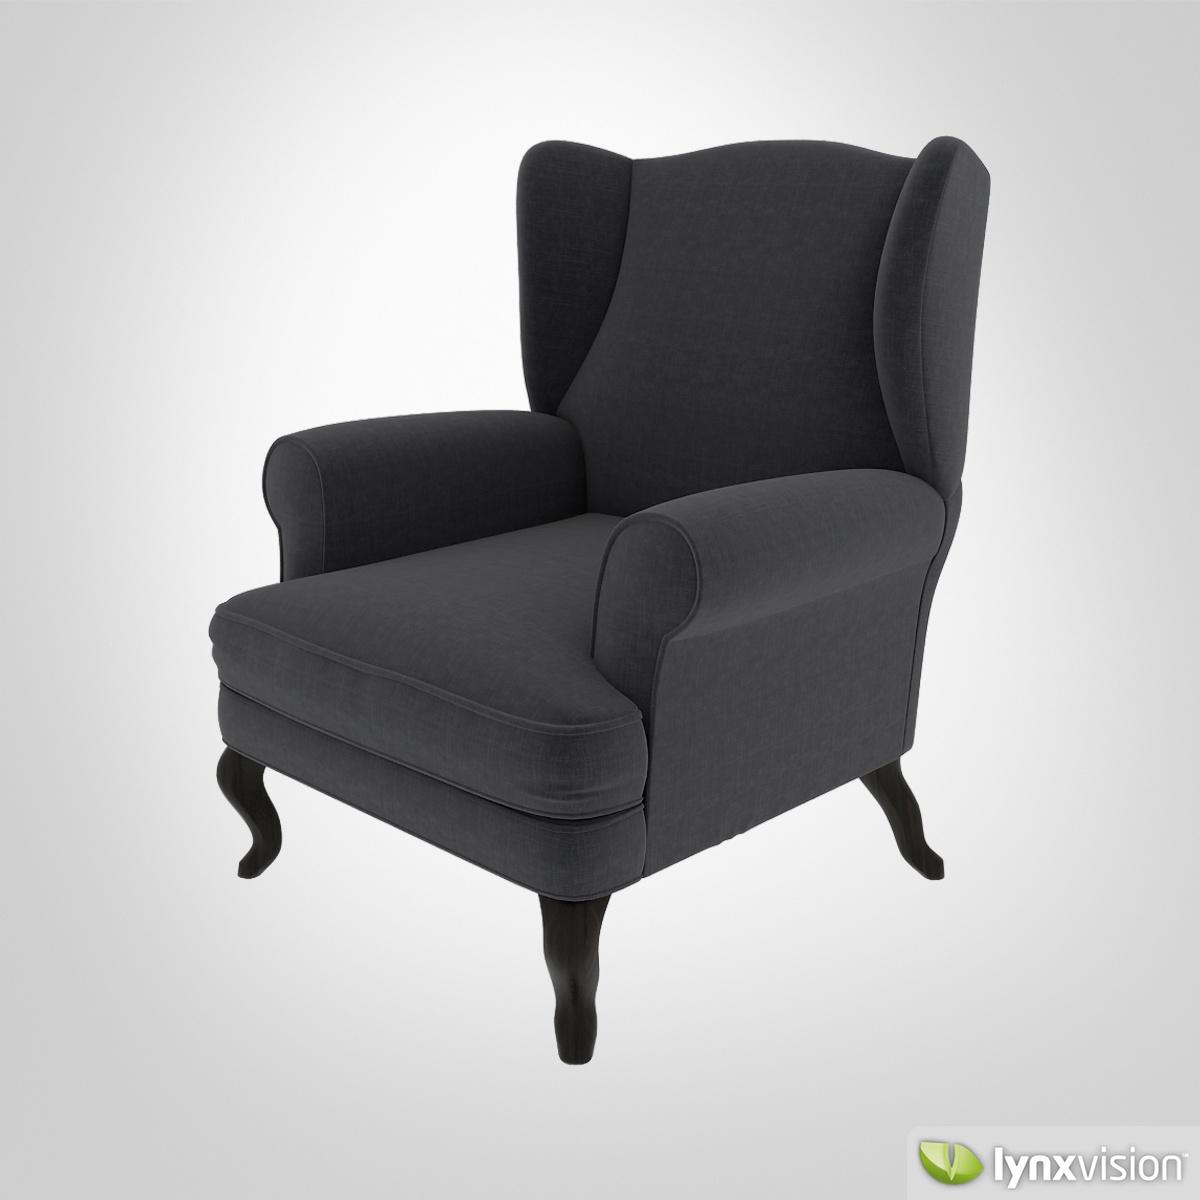 Free Upholstered Armchair Free 3D Model .max .obj .fbx